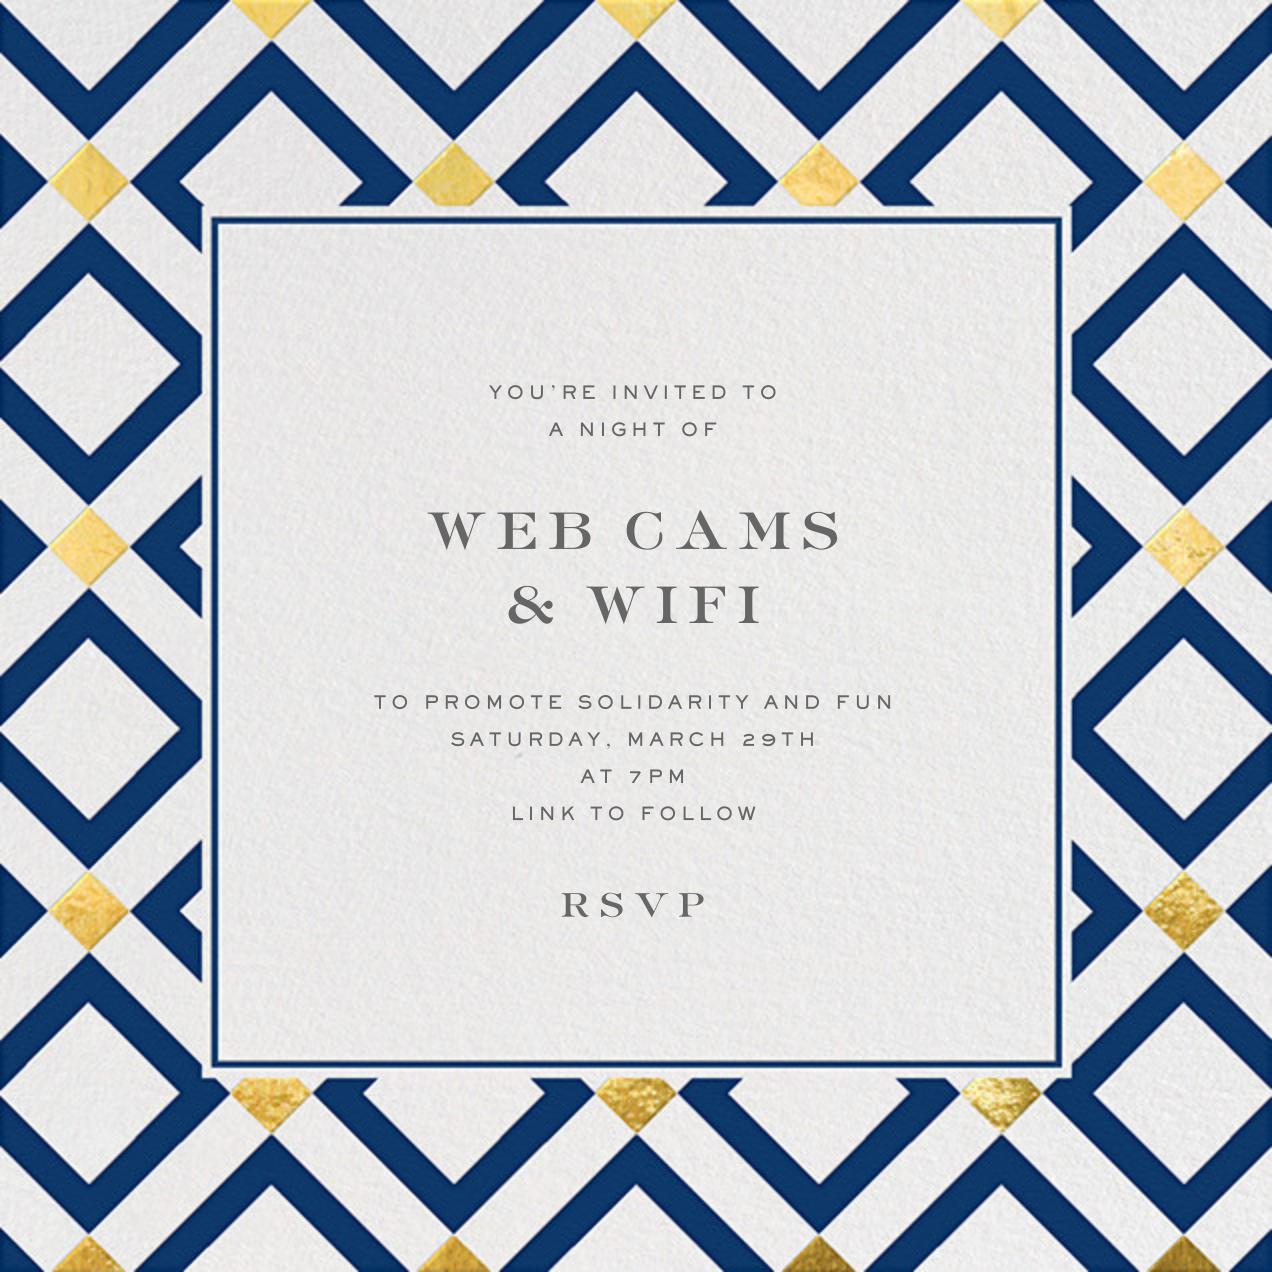 Bobo - Gold and Navy Blue - Jonathan Adler - Virtual parties